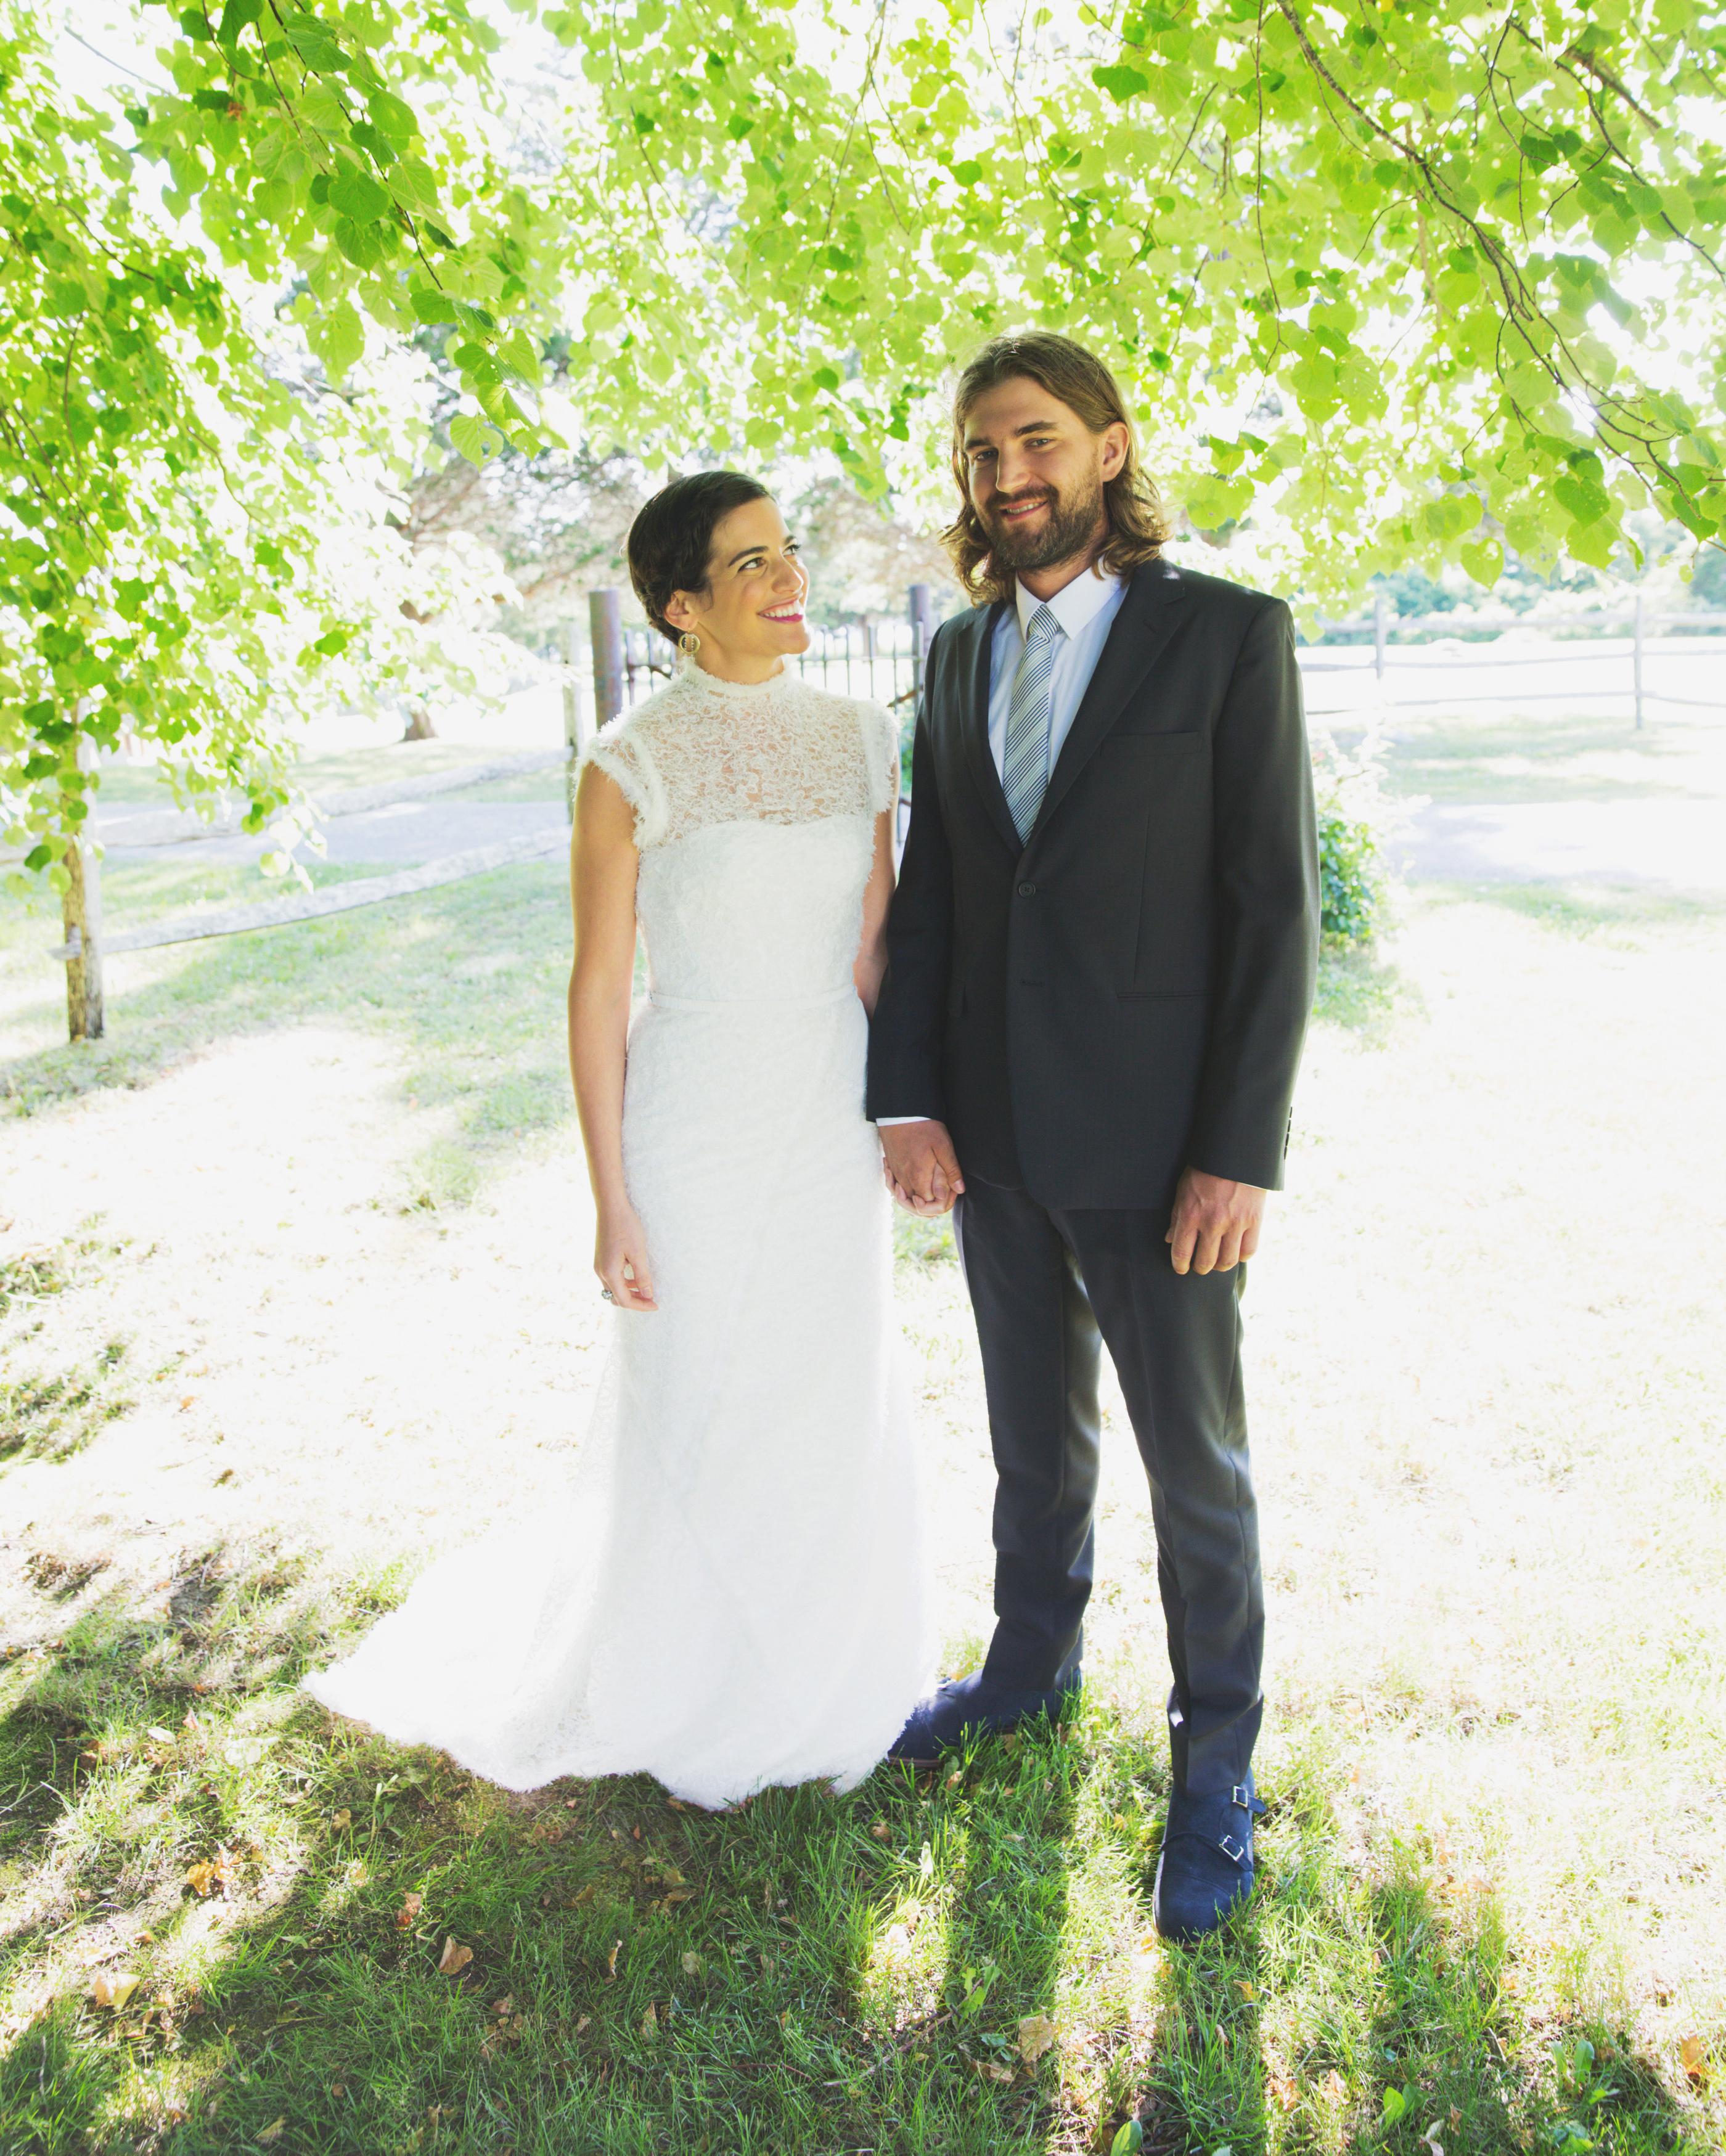 lilly-carter-wedding-couple-00125-s112037-0715..jpg